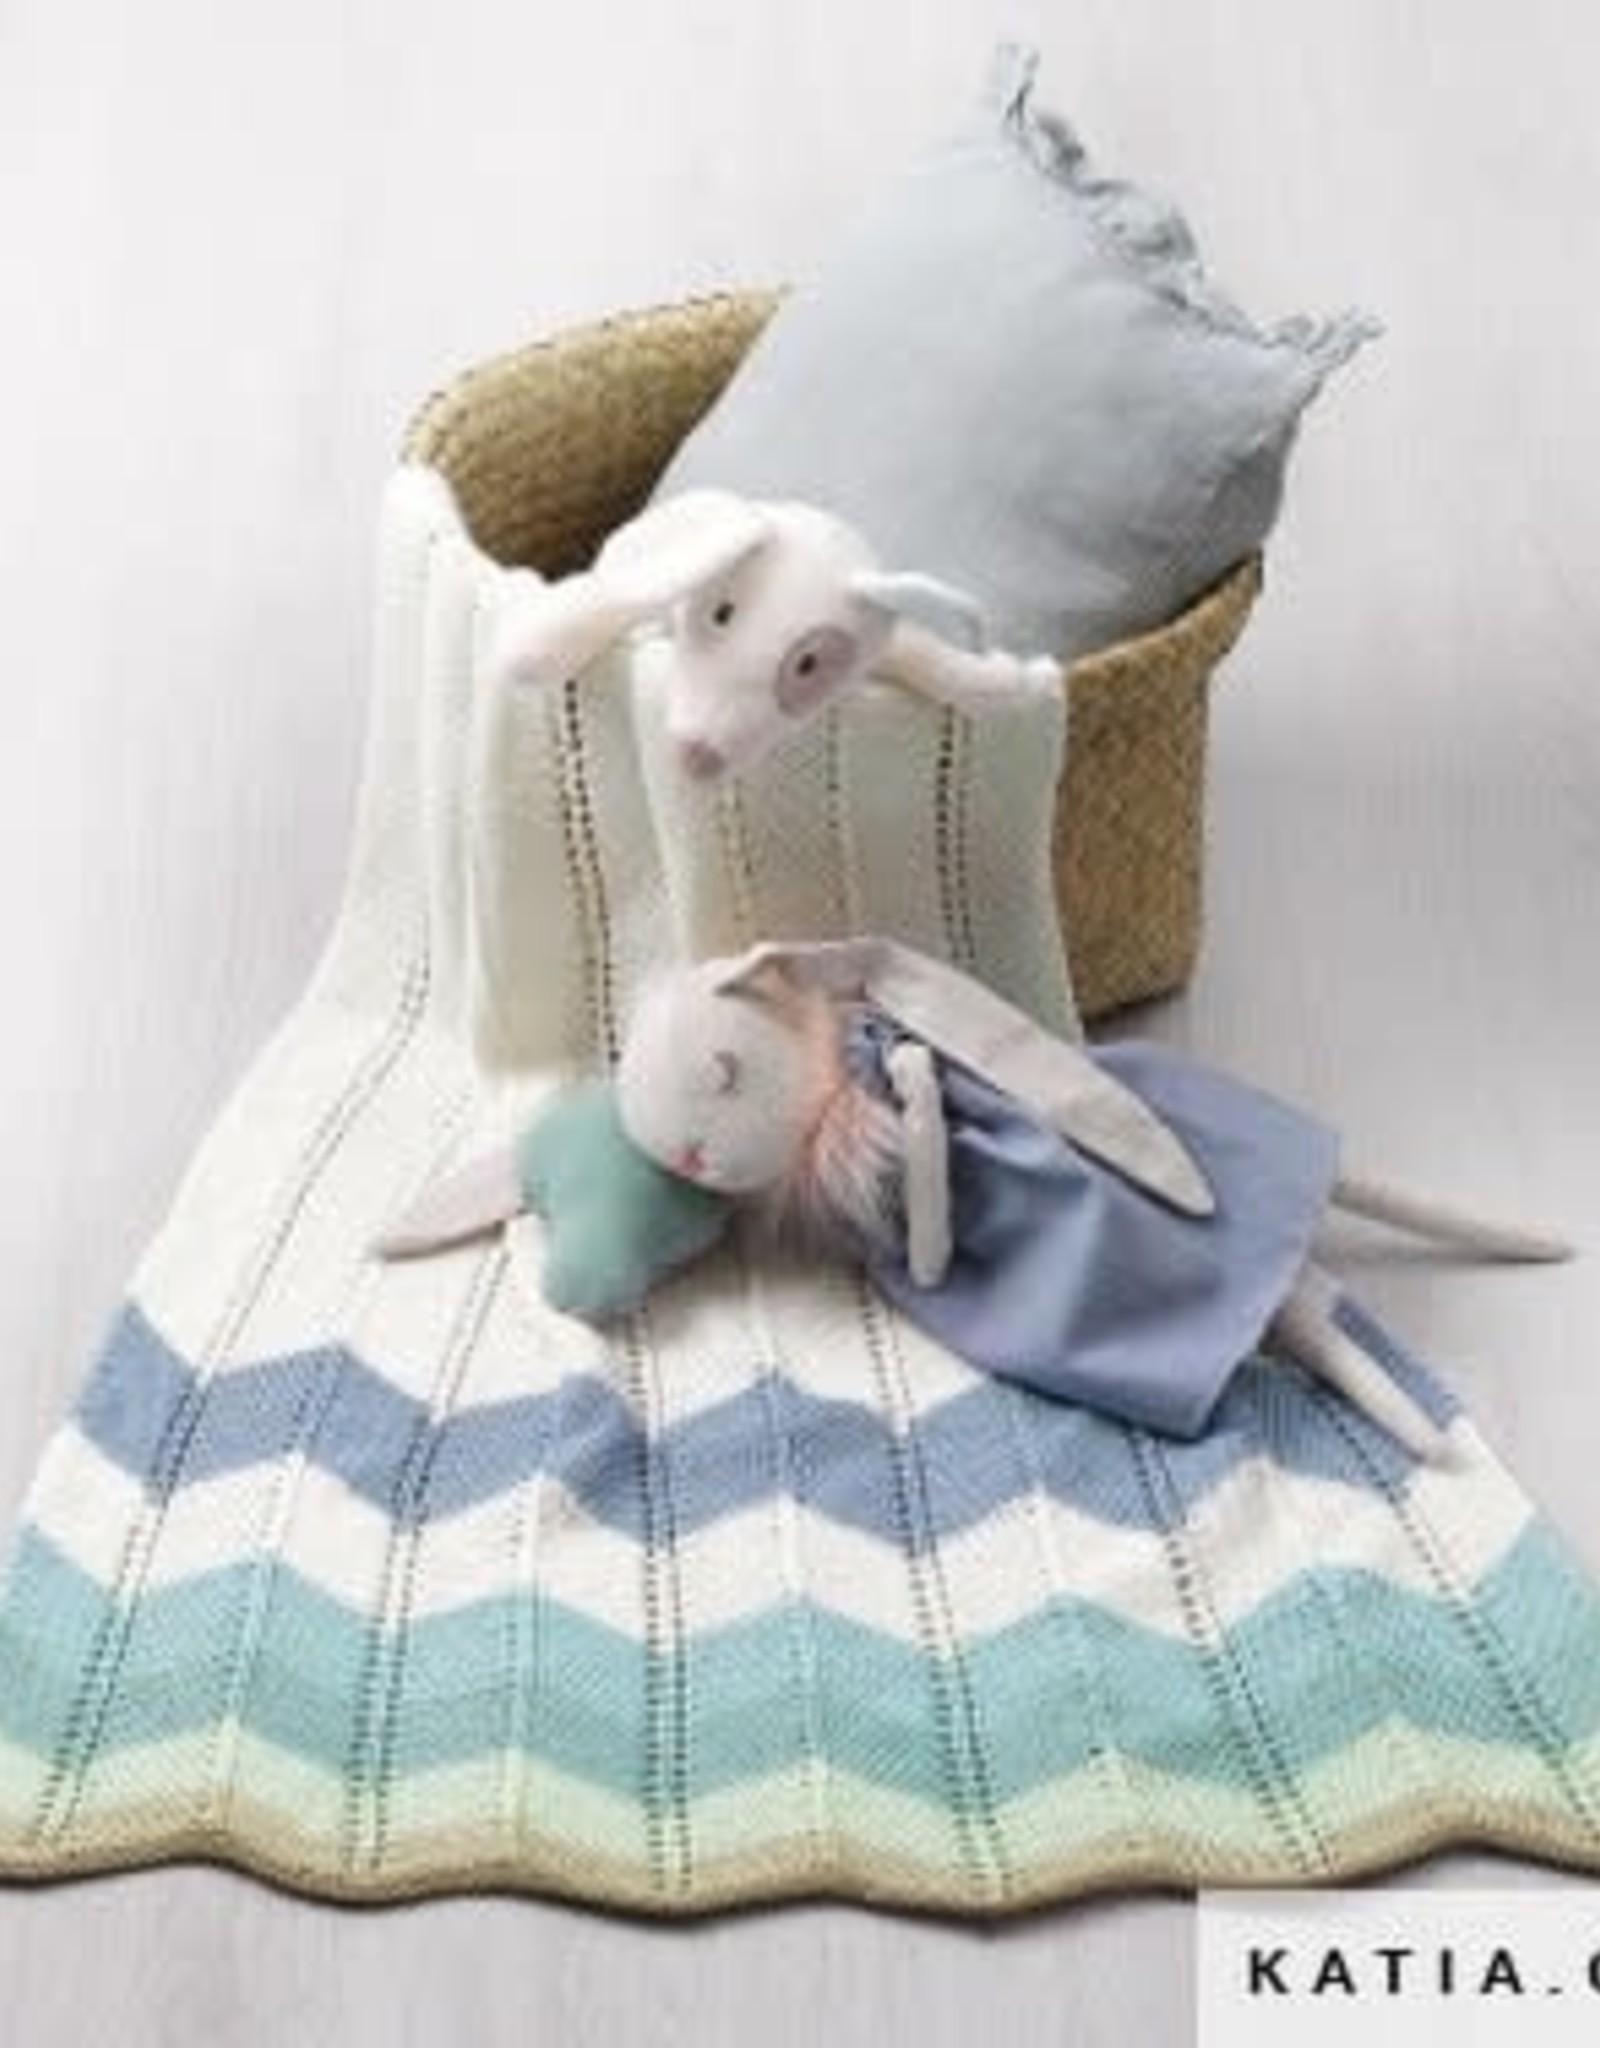 Katia Katia fair cotton Craft 500